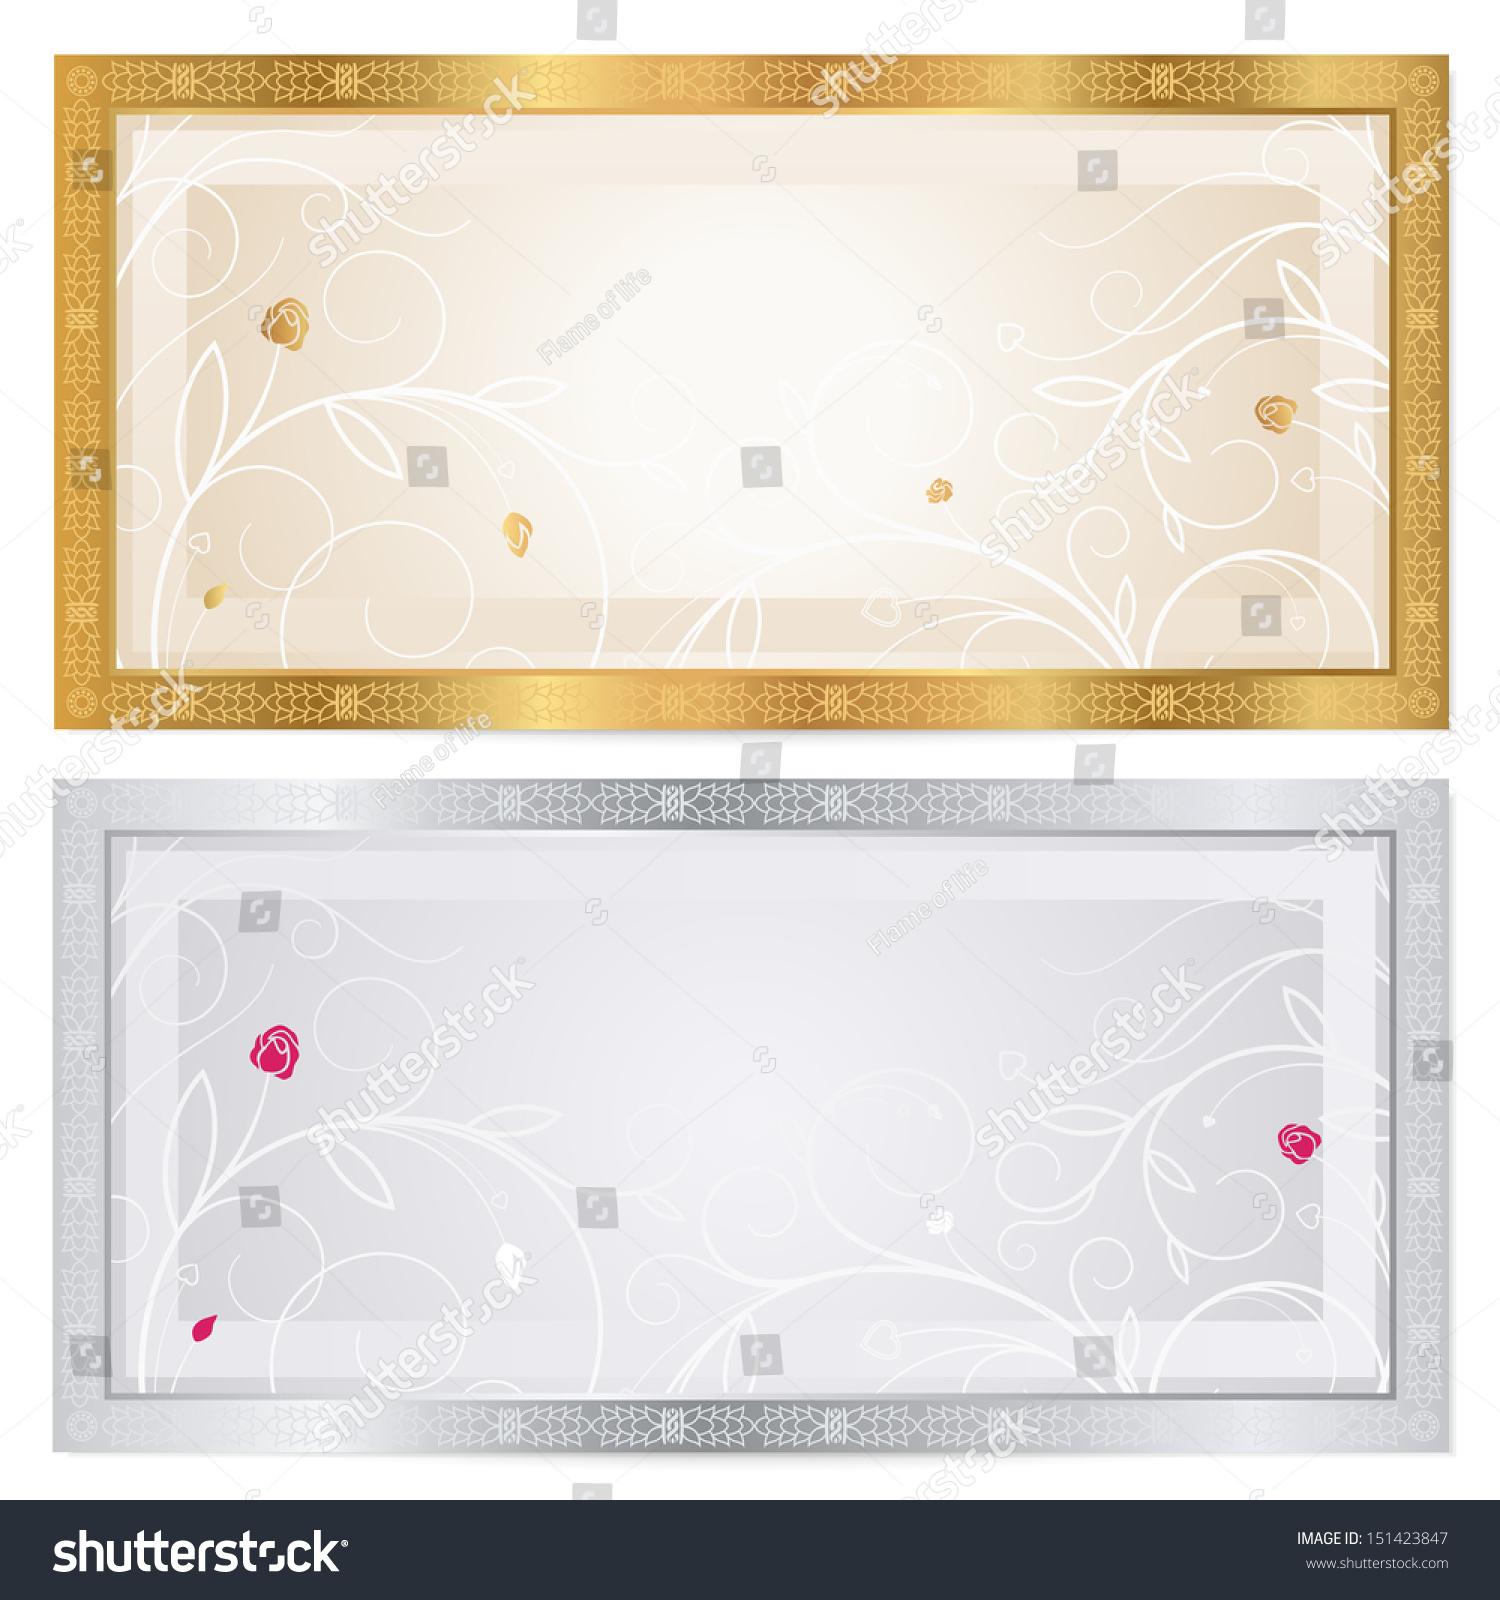 Gift Certificate Voucher Coupon Ticket Template Illustration – Ticket Voucher Template